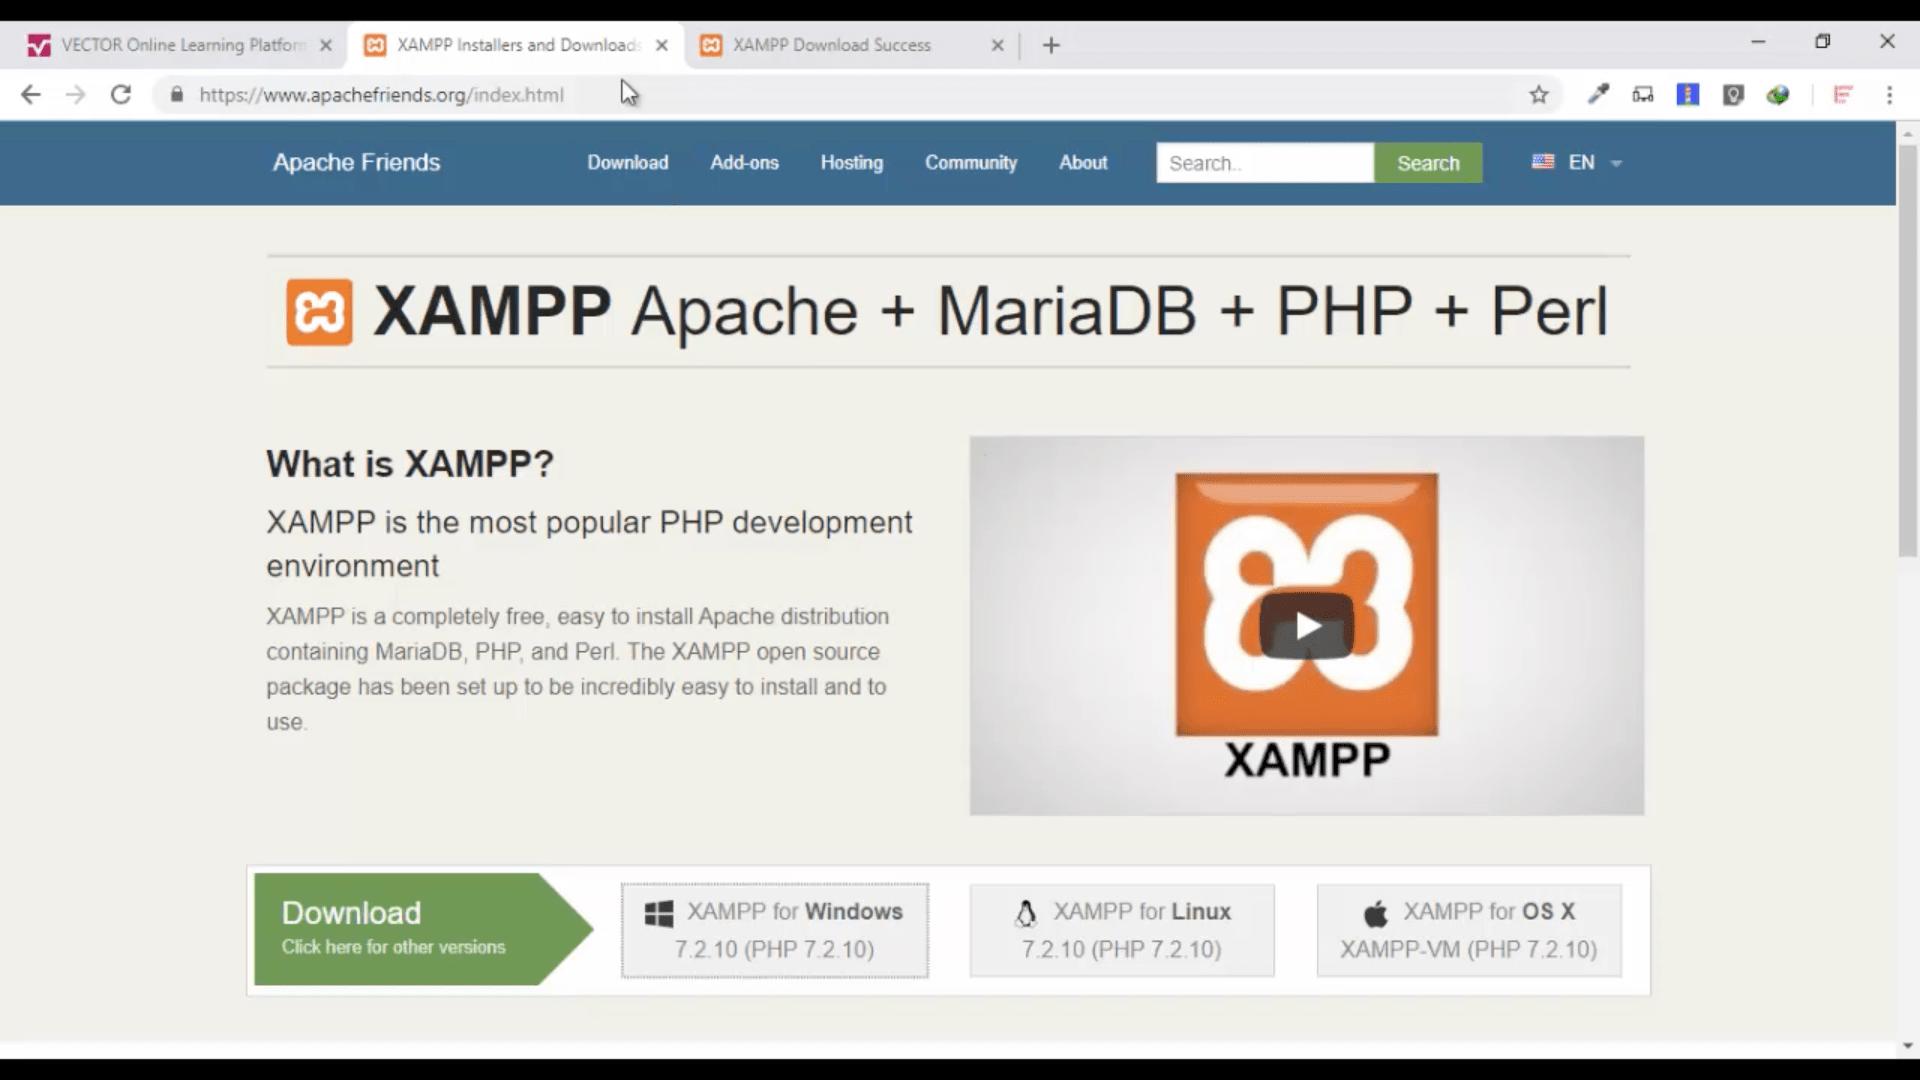 007-Install-and-Setup-XAMPP-Local-Host-wp_course-min